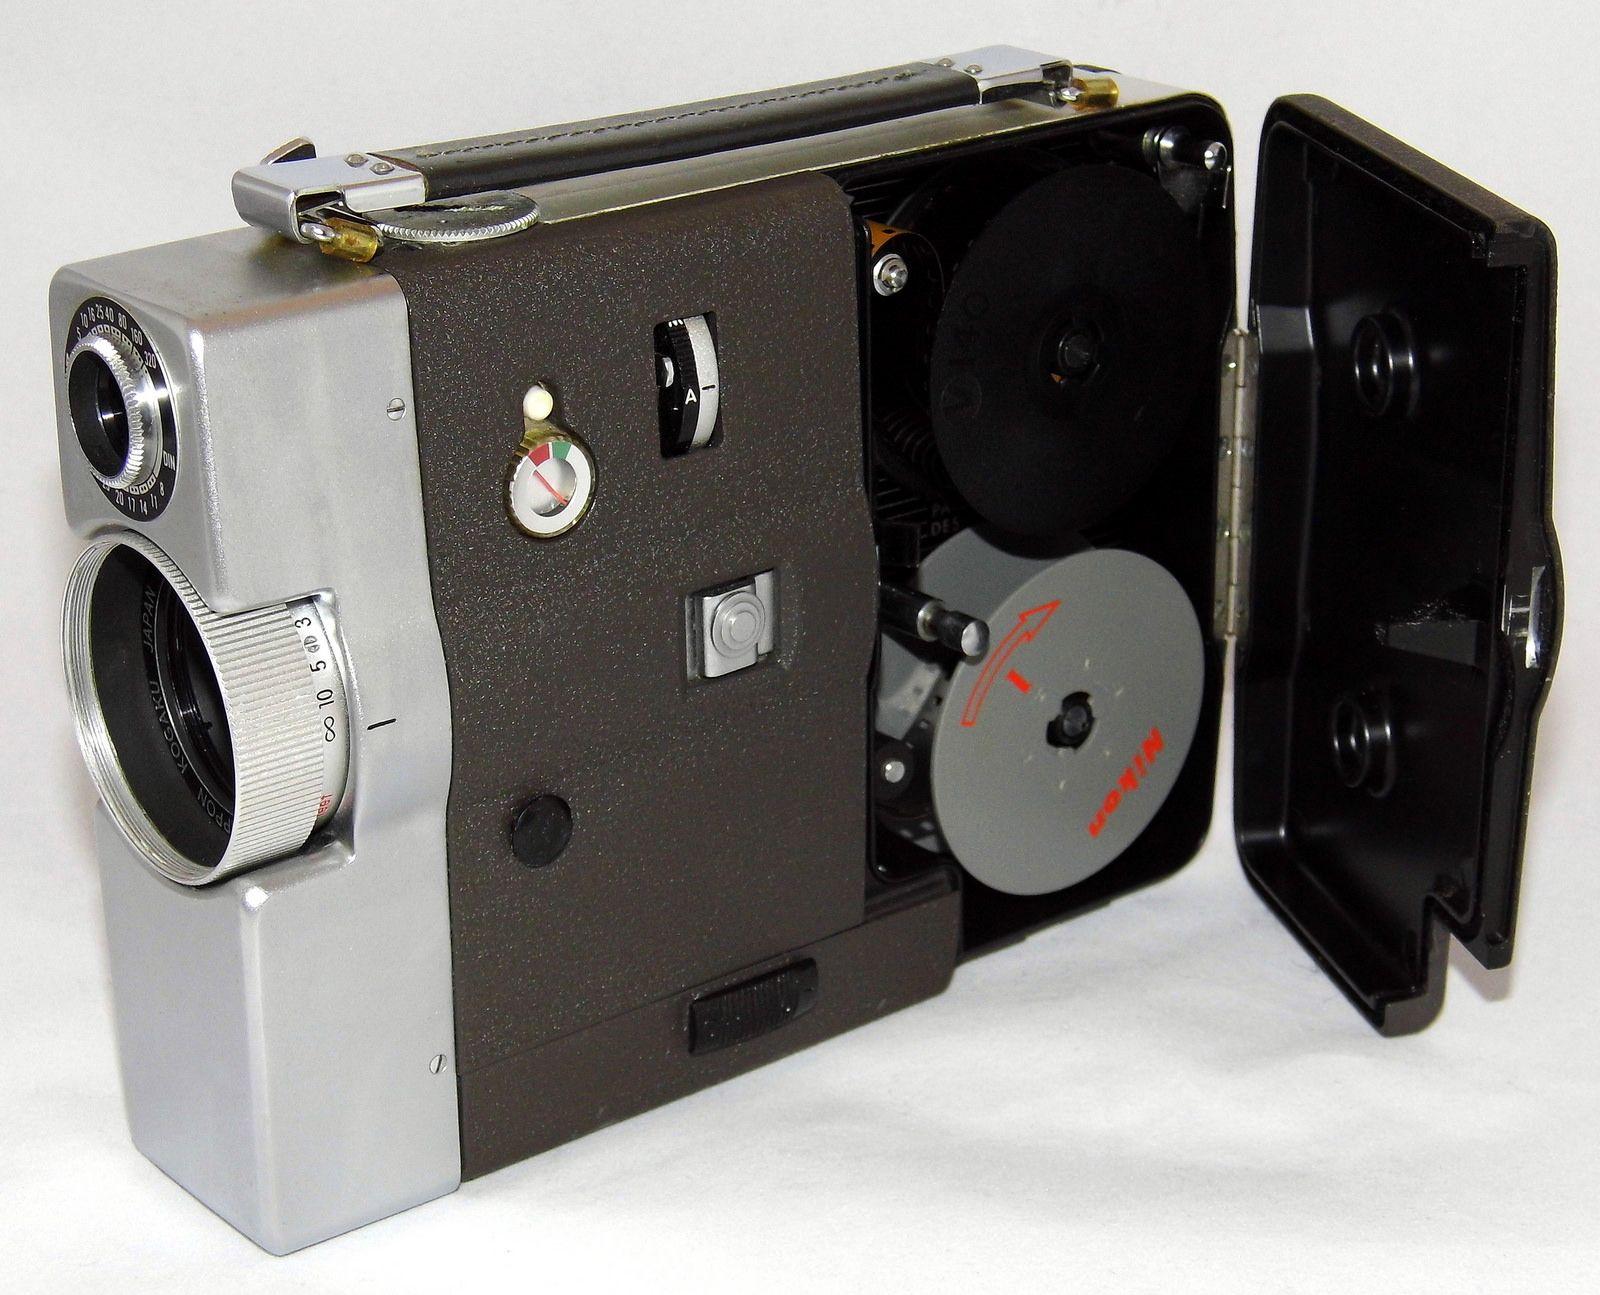 Vintage Nikkorex Zoom 8 Movie Camera Cine Zoom Nikkor 8 32mm F 1 8 Lens And Slr Finder Made In Japan Circa 1960s Movie Camera Camera Fujifilm Instax Mini